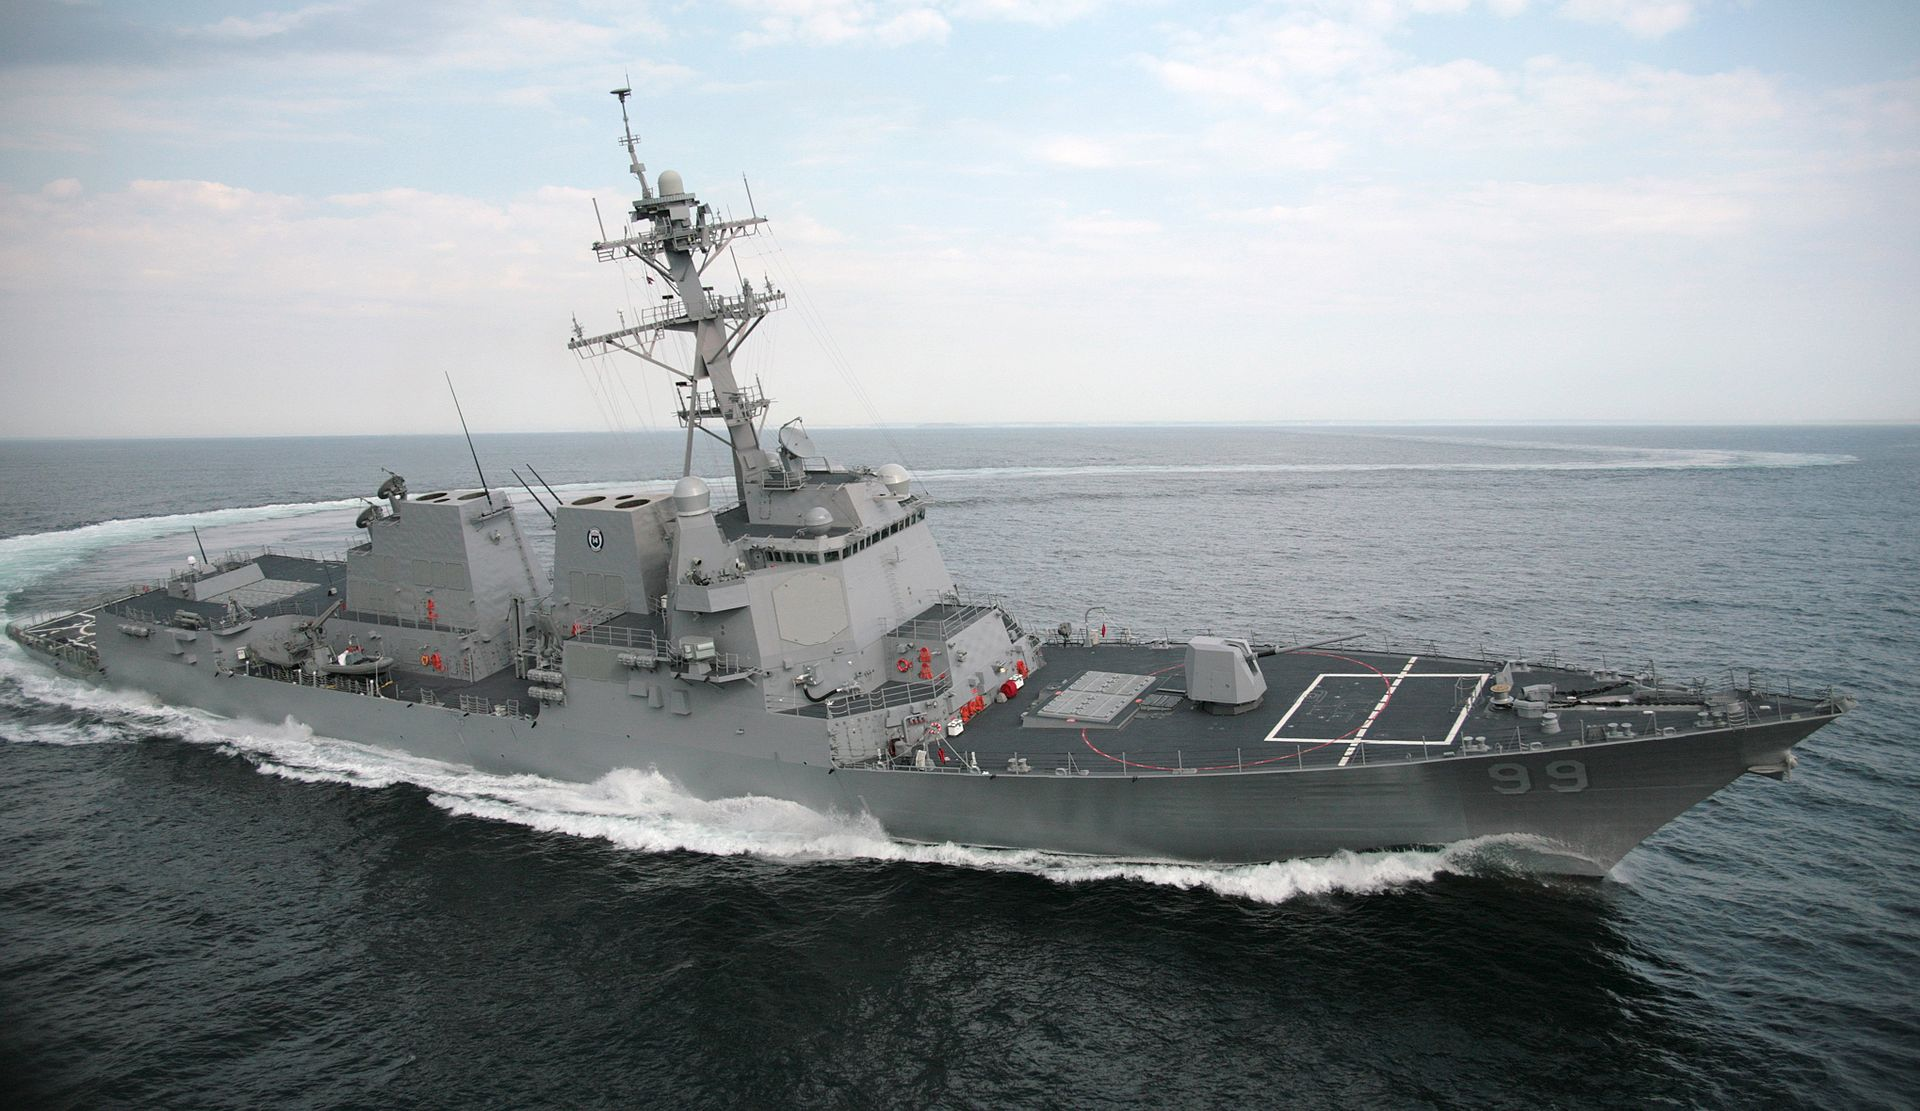 File:USS Farragut (DLG-6) at Helsinki, Finland, on 30 June